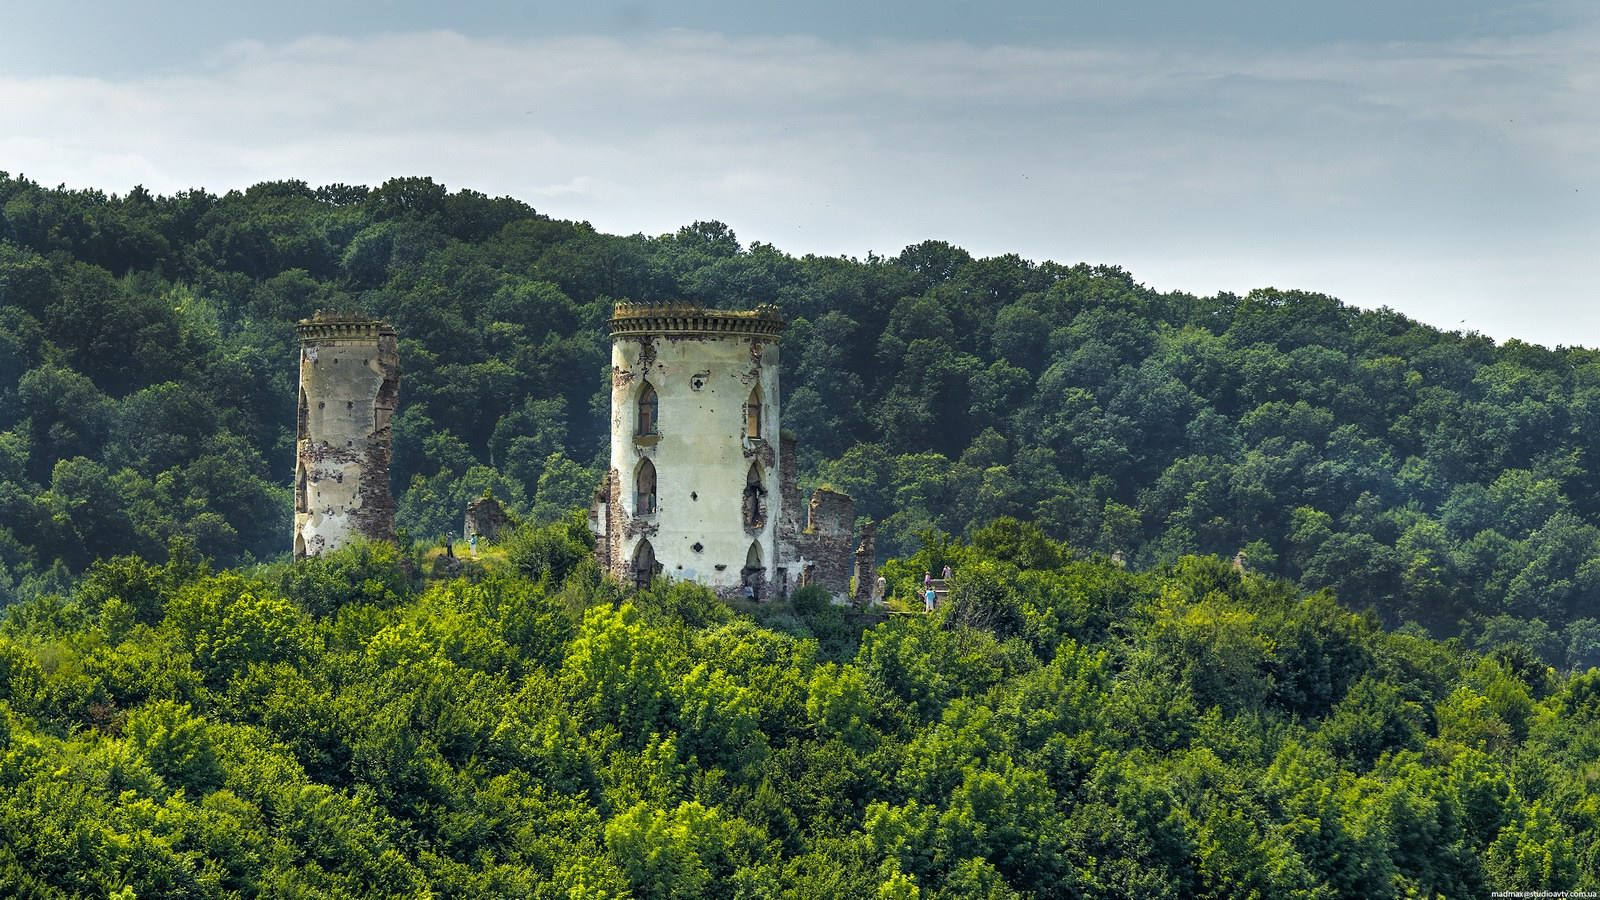 Chervonograd: a selection of sites